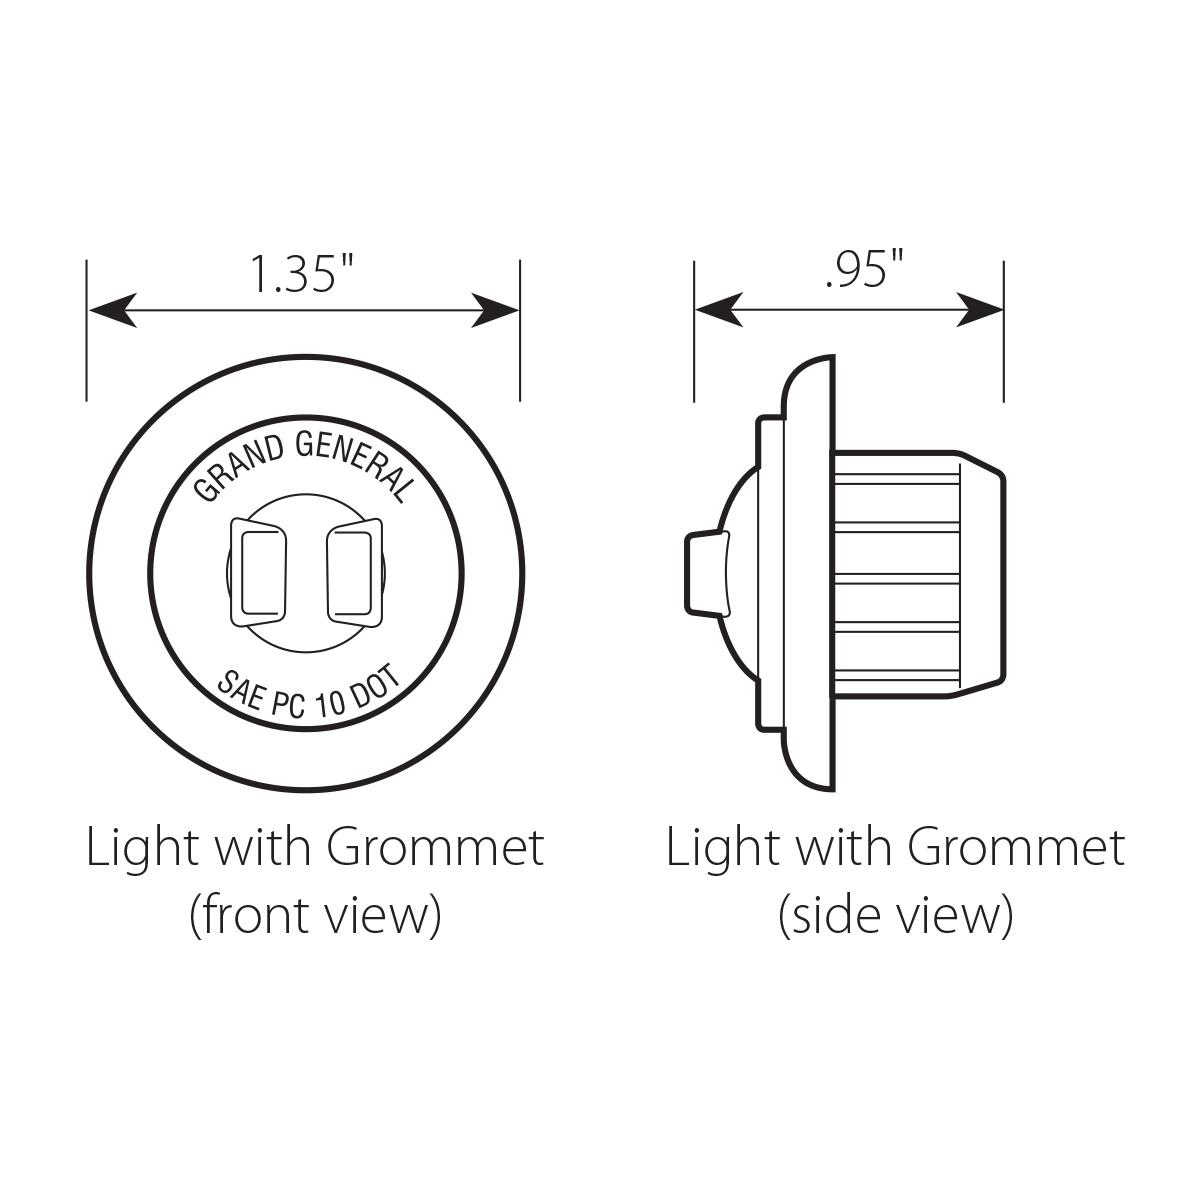 kenworth k200 fuse box diagram